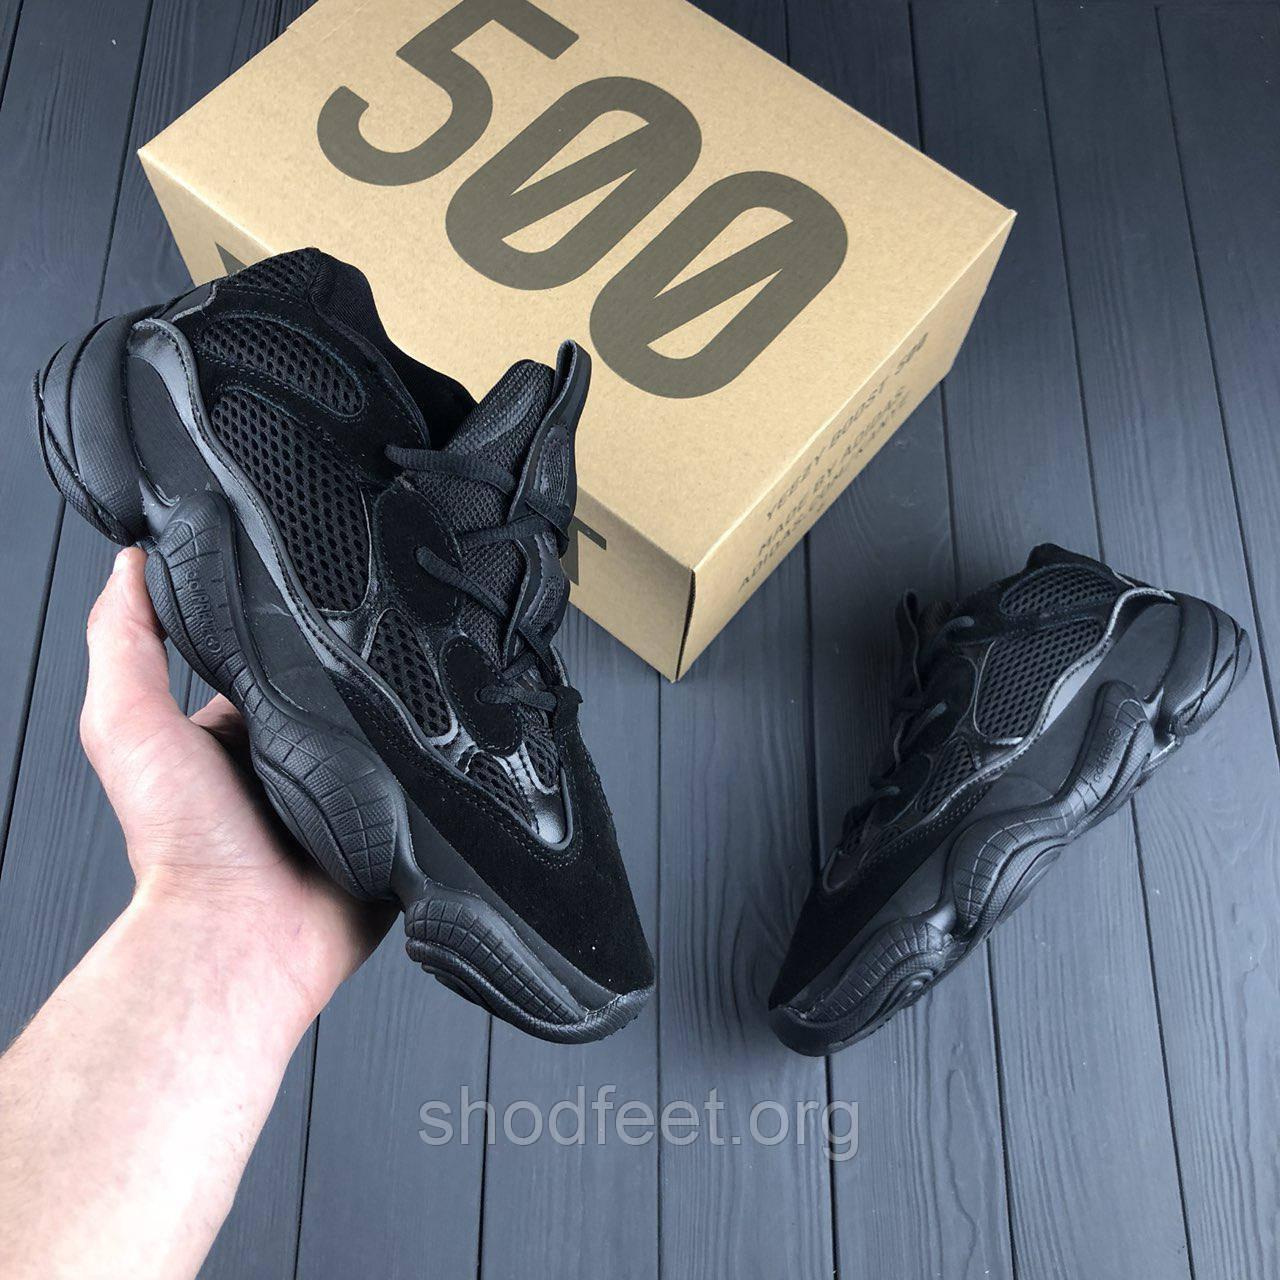 check out cb5d8 ccd7f Мужские кроссовки Adidas Yeezy Desert Rat 500 Utility Black